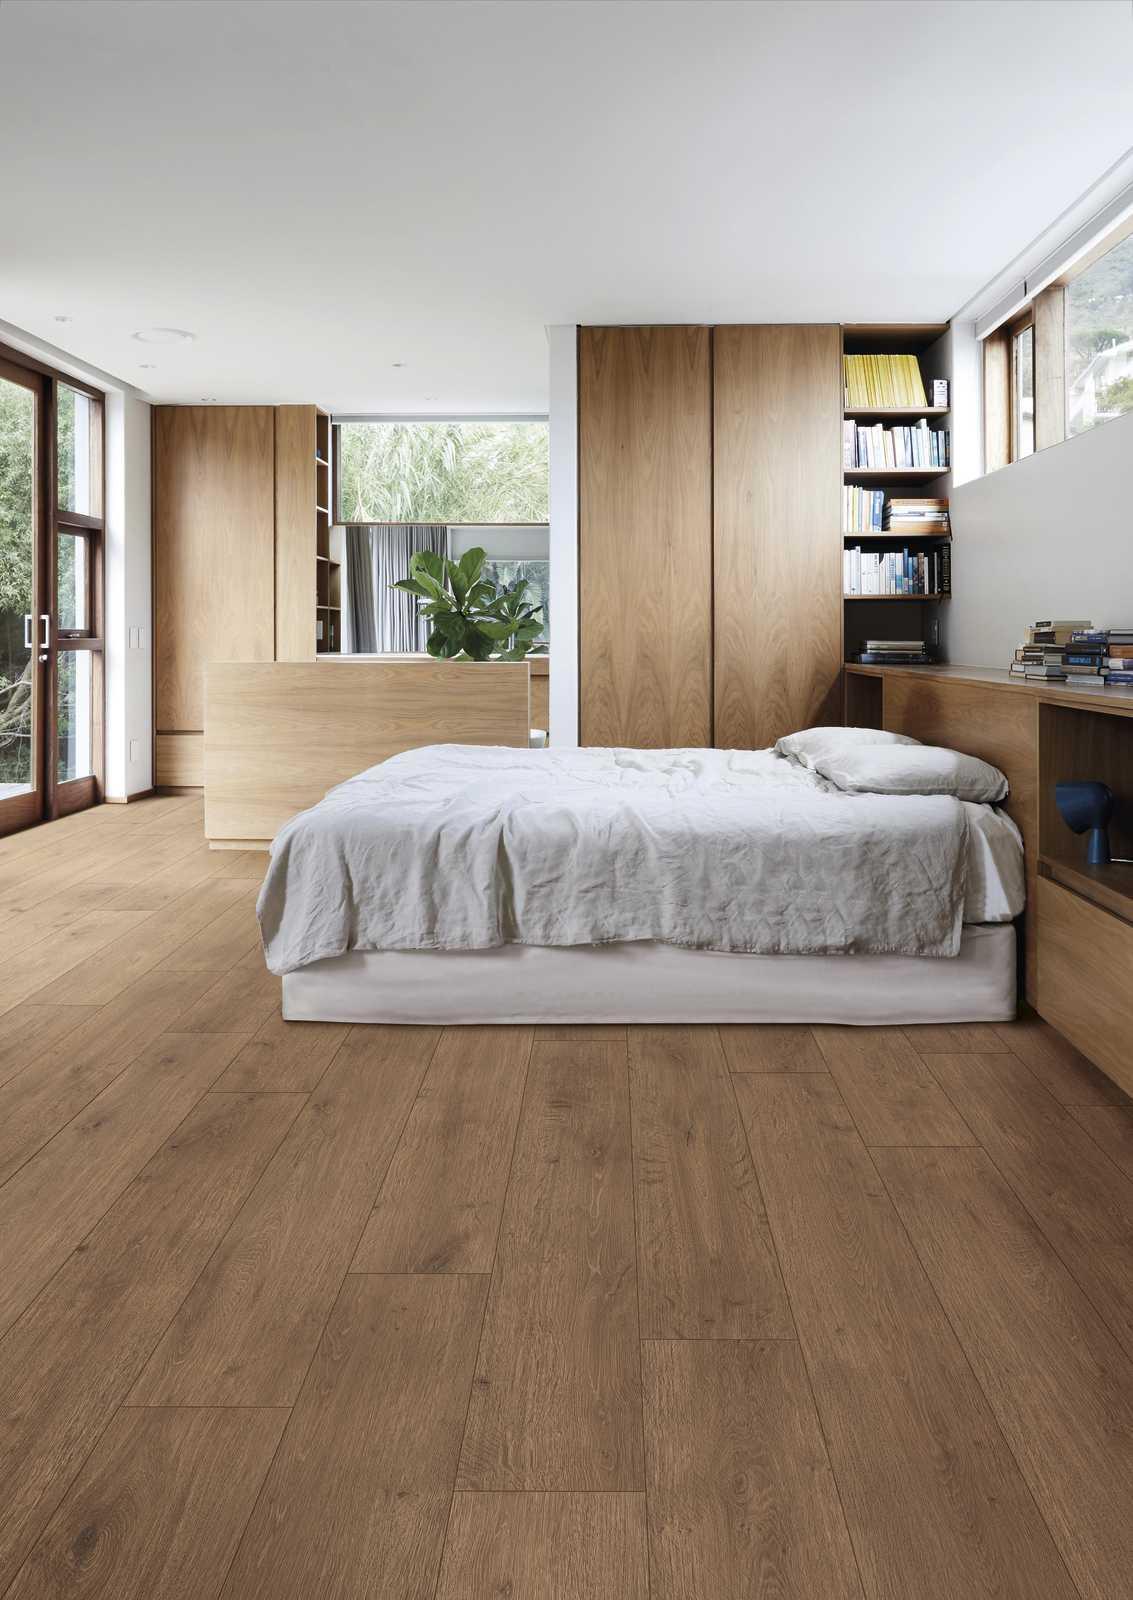 Bedroom Tiles  Ceramic Tiles for the Bedroom Area  Ragno